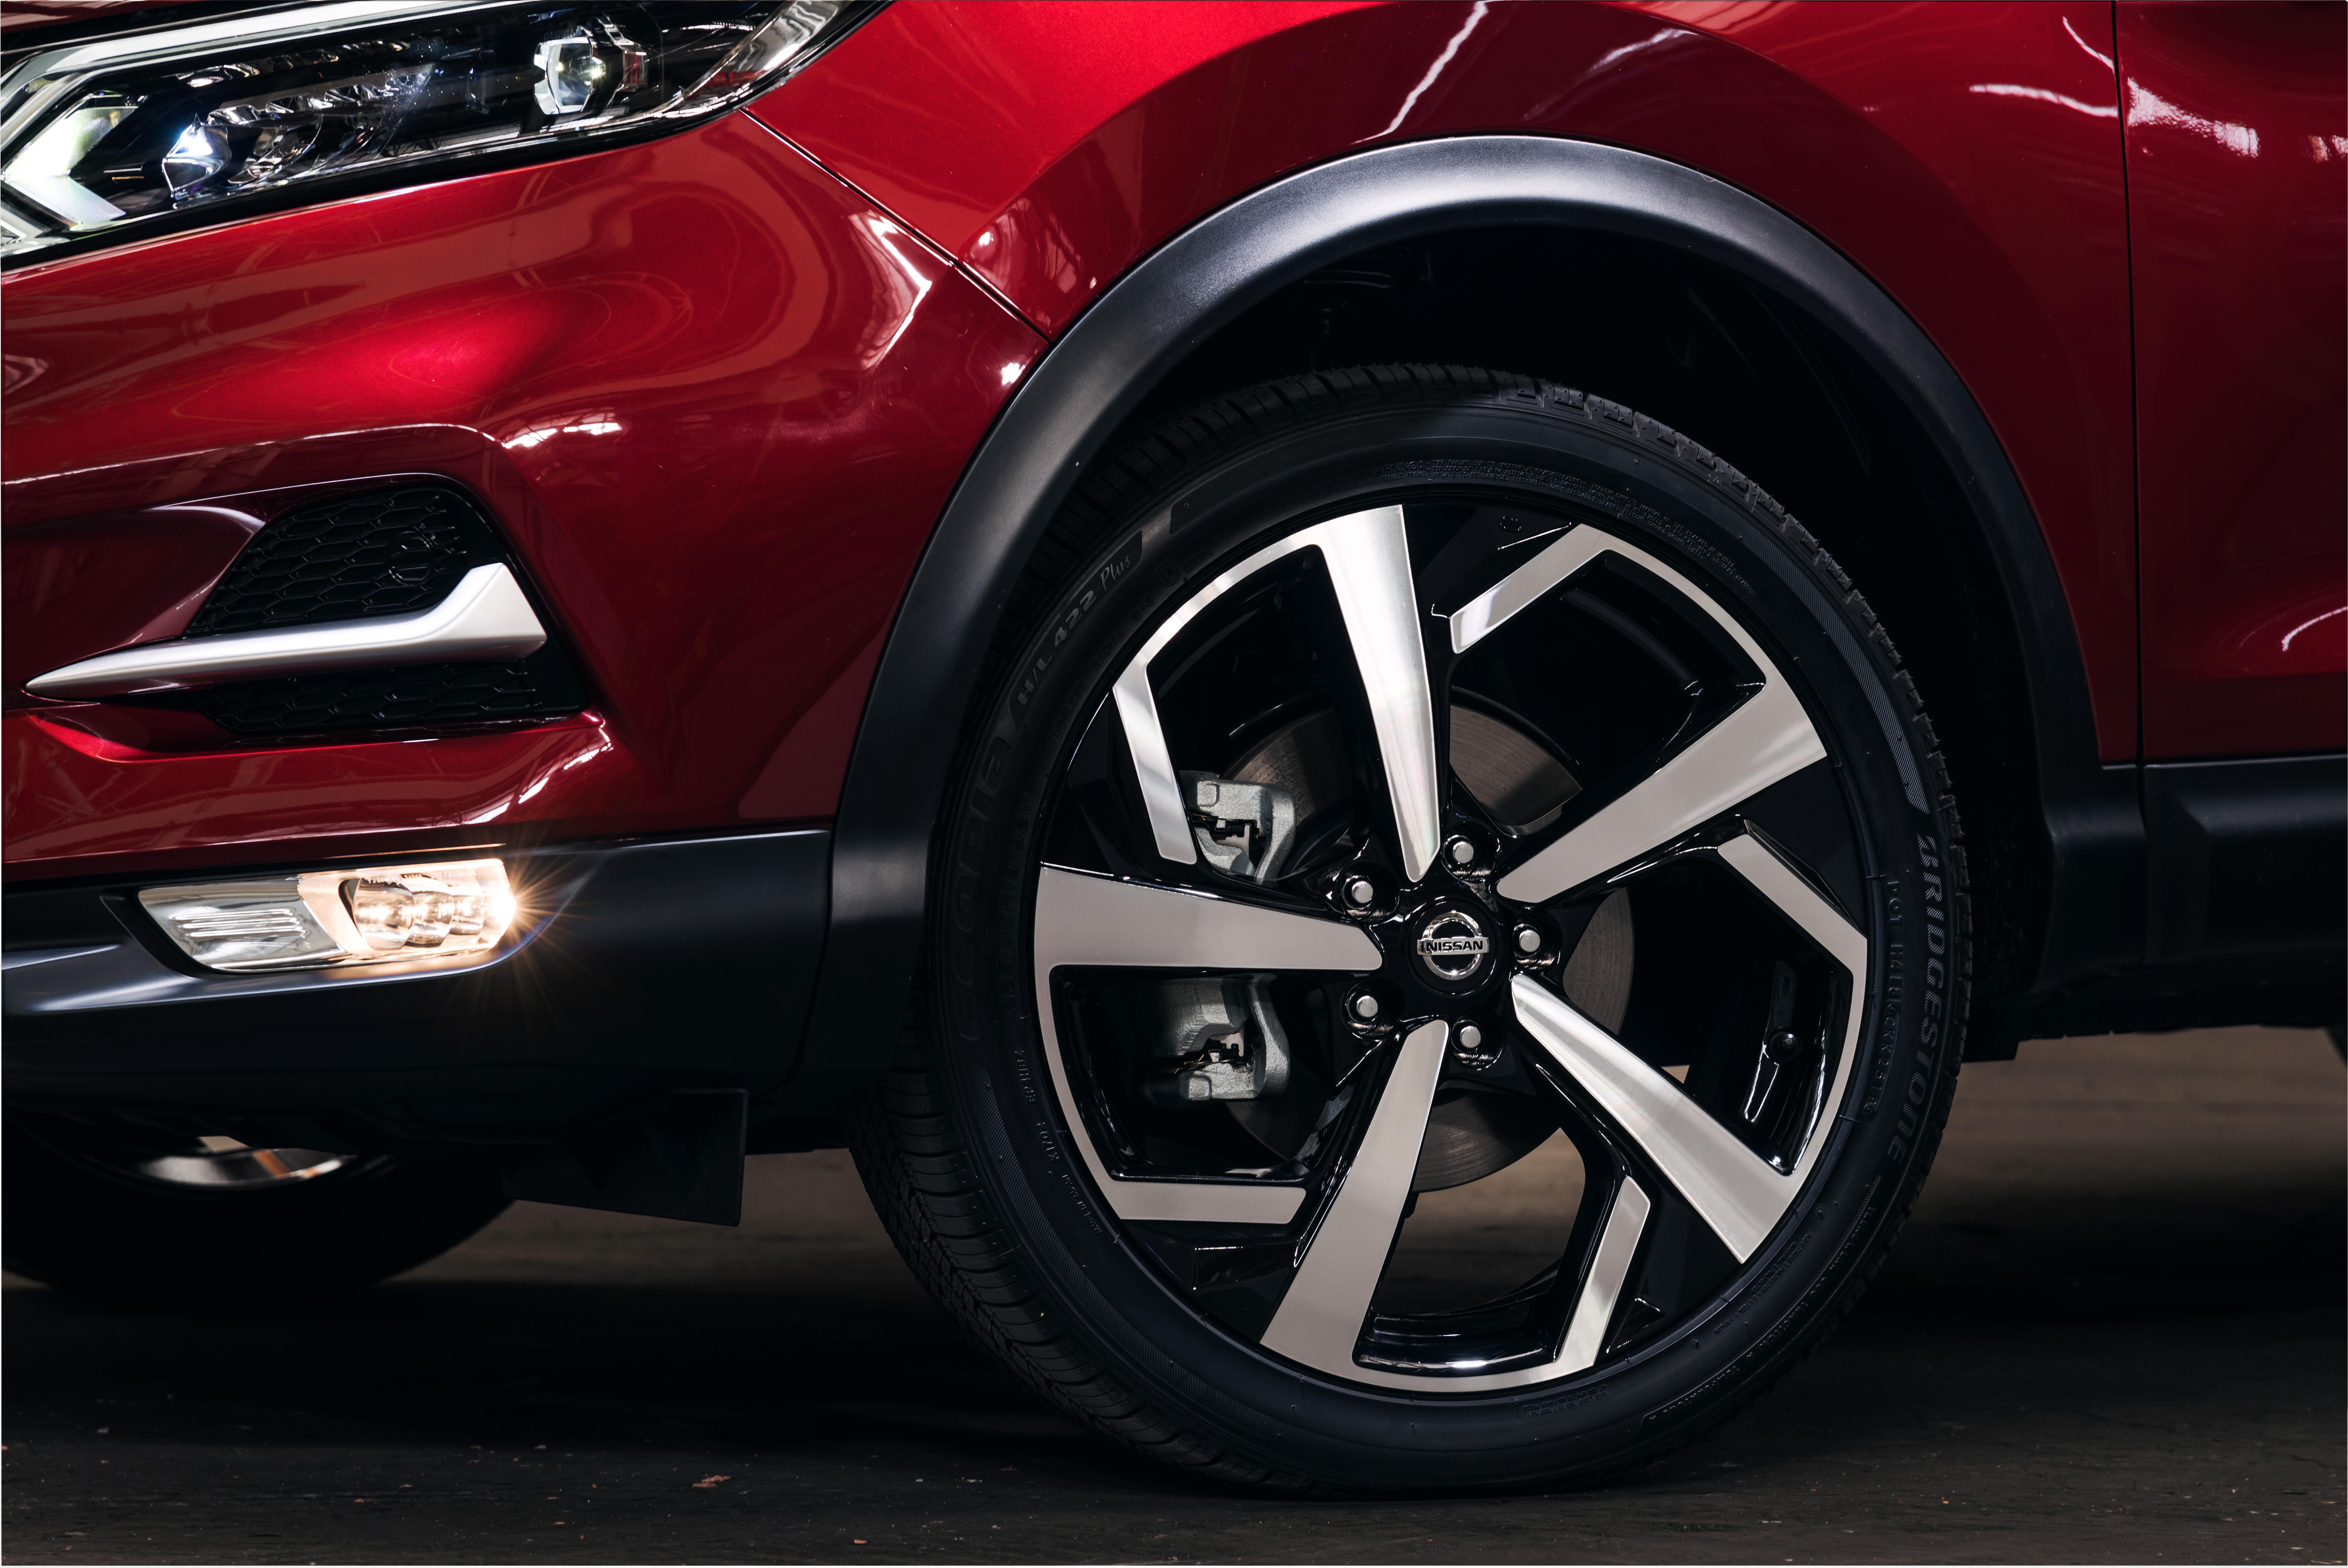 2020 Nissan Rogue Sport 536143 Best Quality Free High